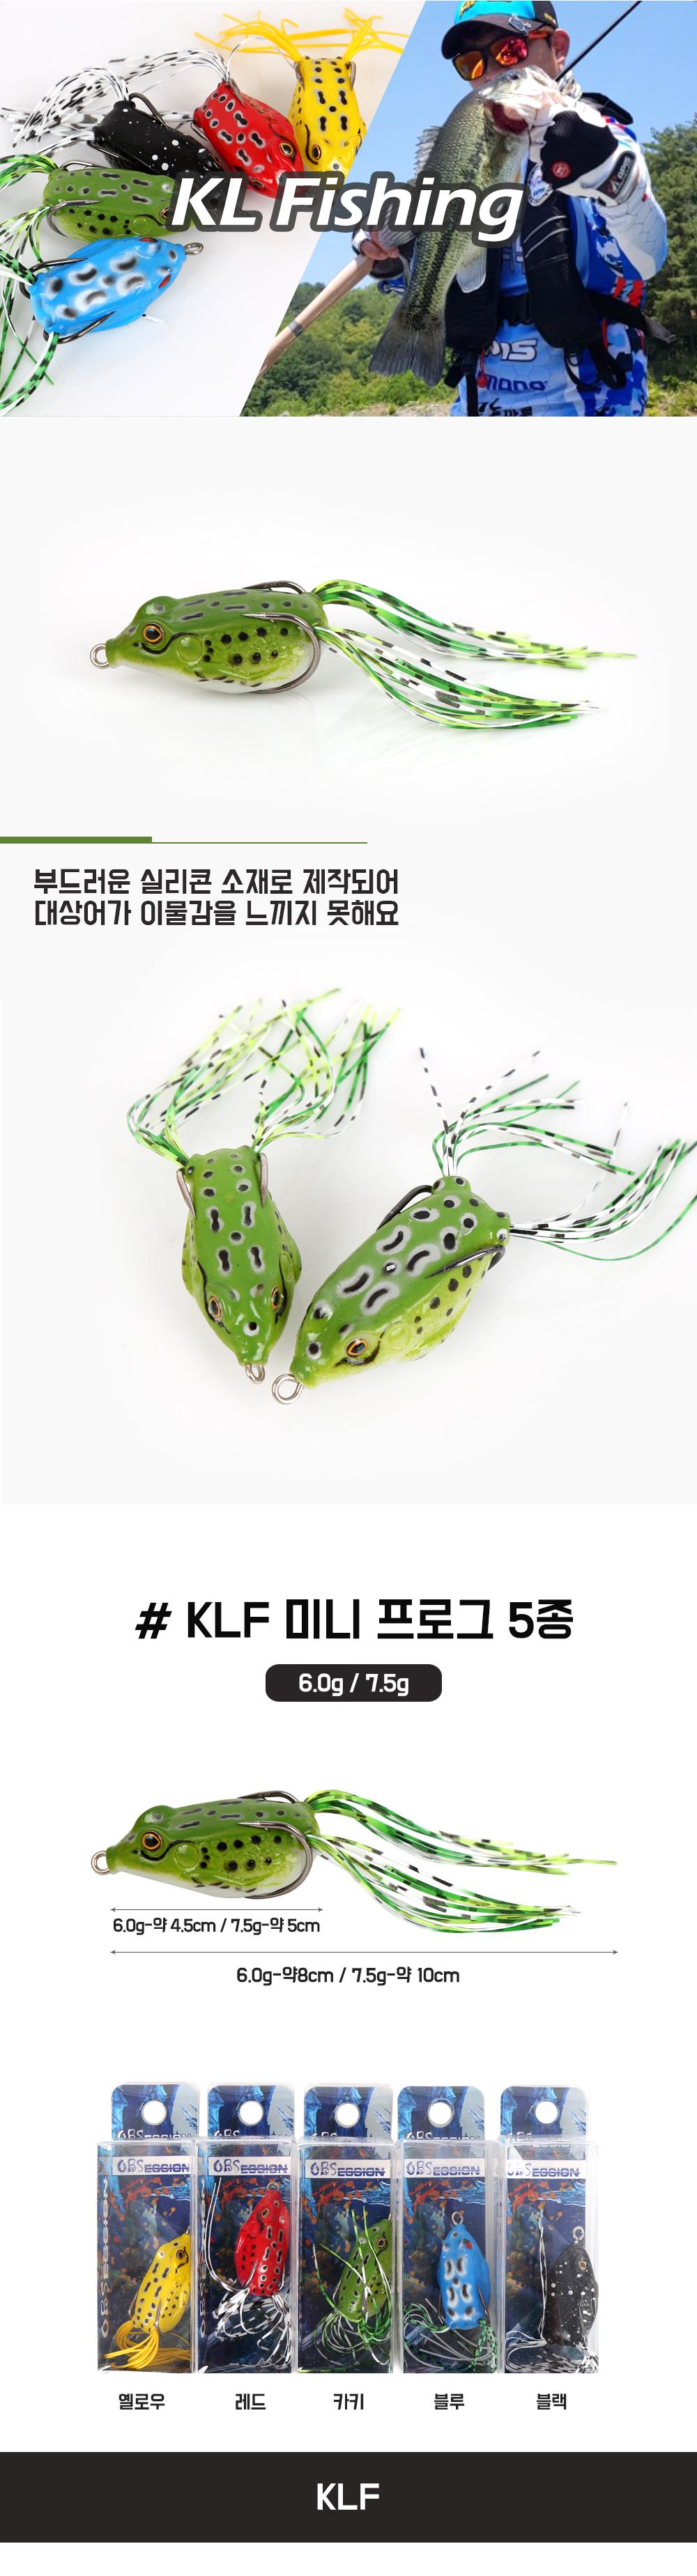 KLF 미니 프로그 5종  6.0g/7.5g 탑워터 프로그 프러그 개구리루어 개구리 피네스루어 피네스프로그 스피닝프로그